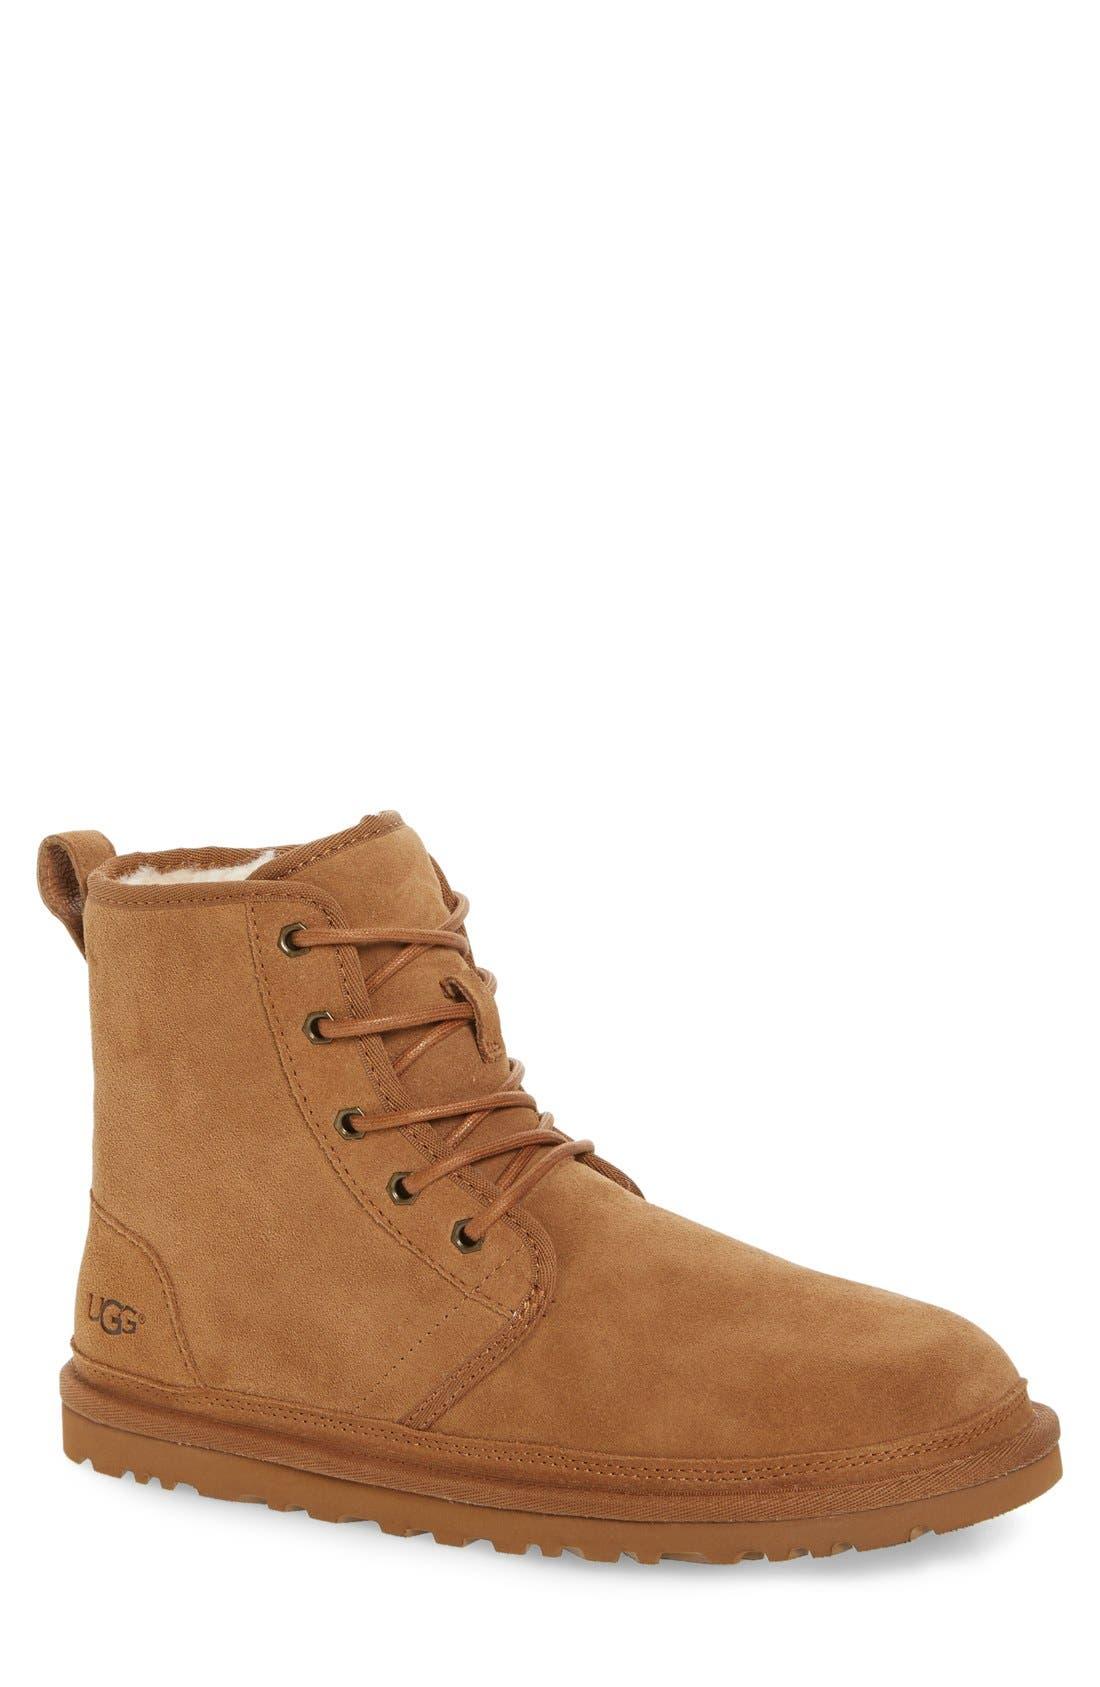 Main Image - UGG� Harkley Lace-Up Boot (Men)